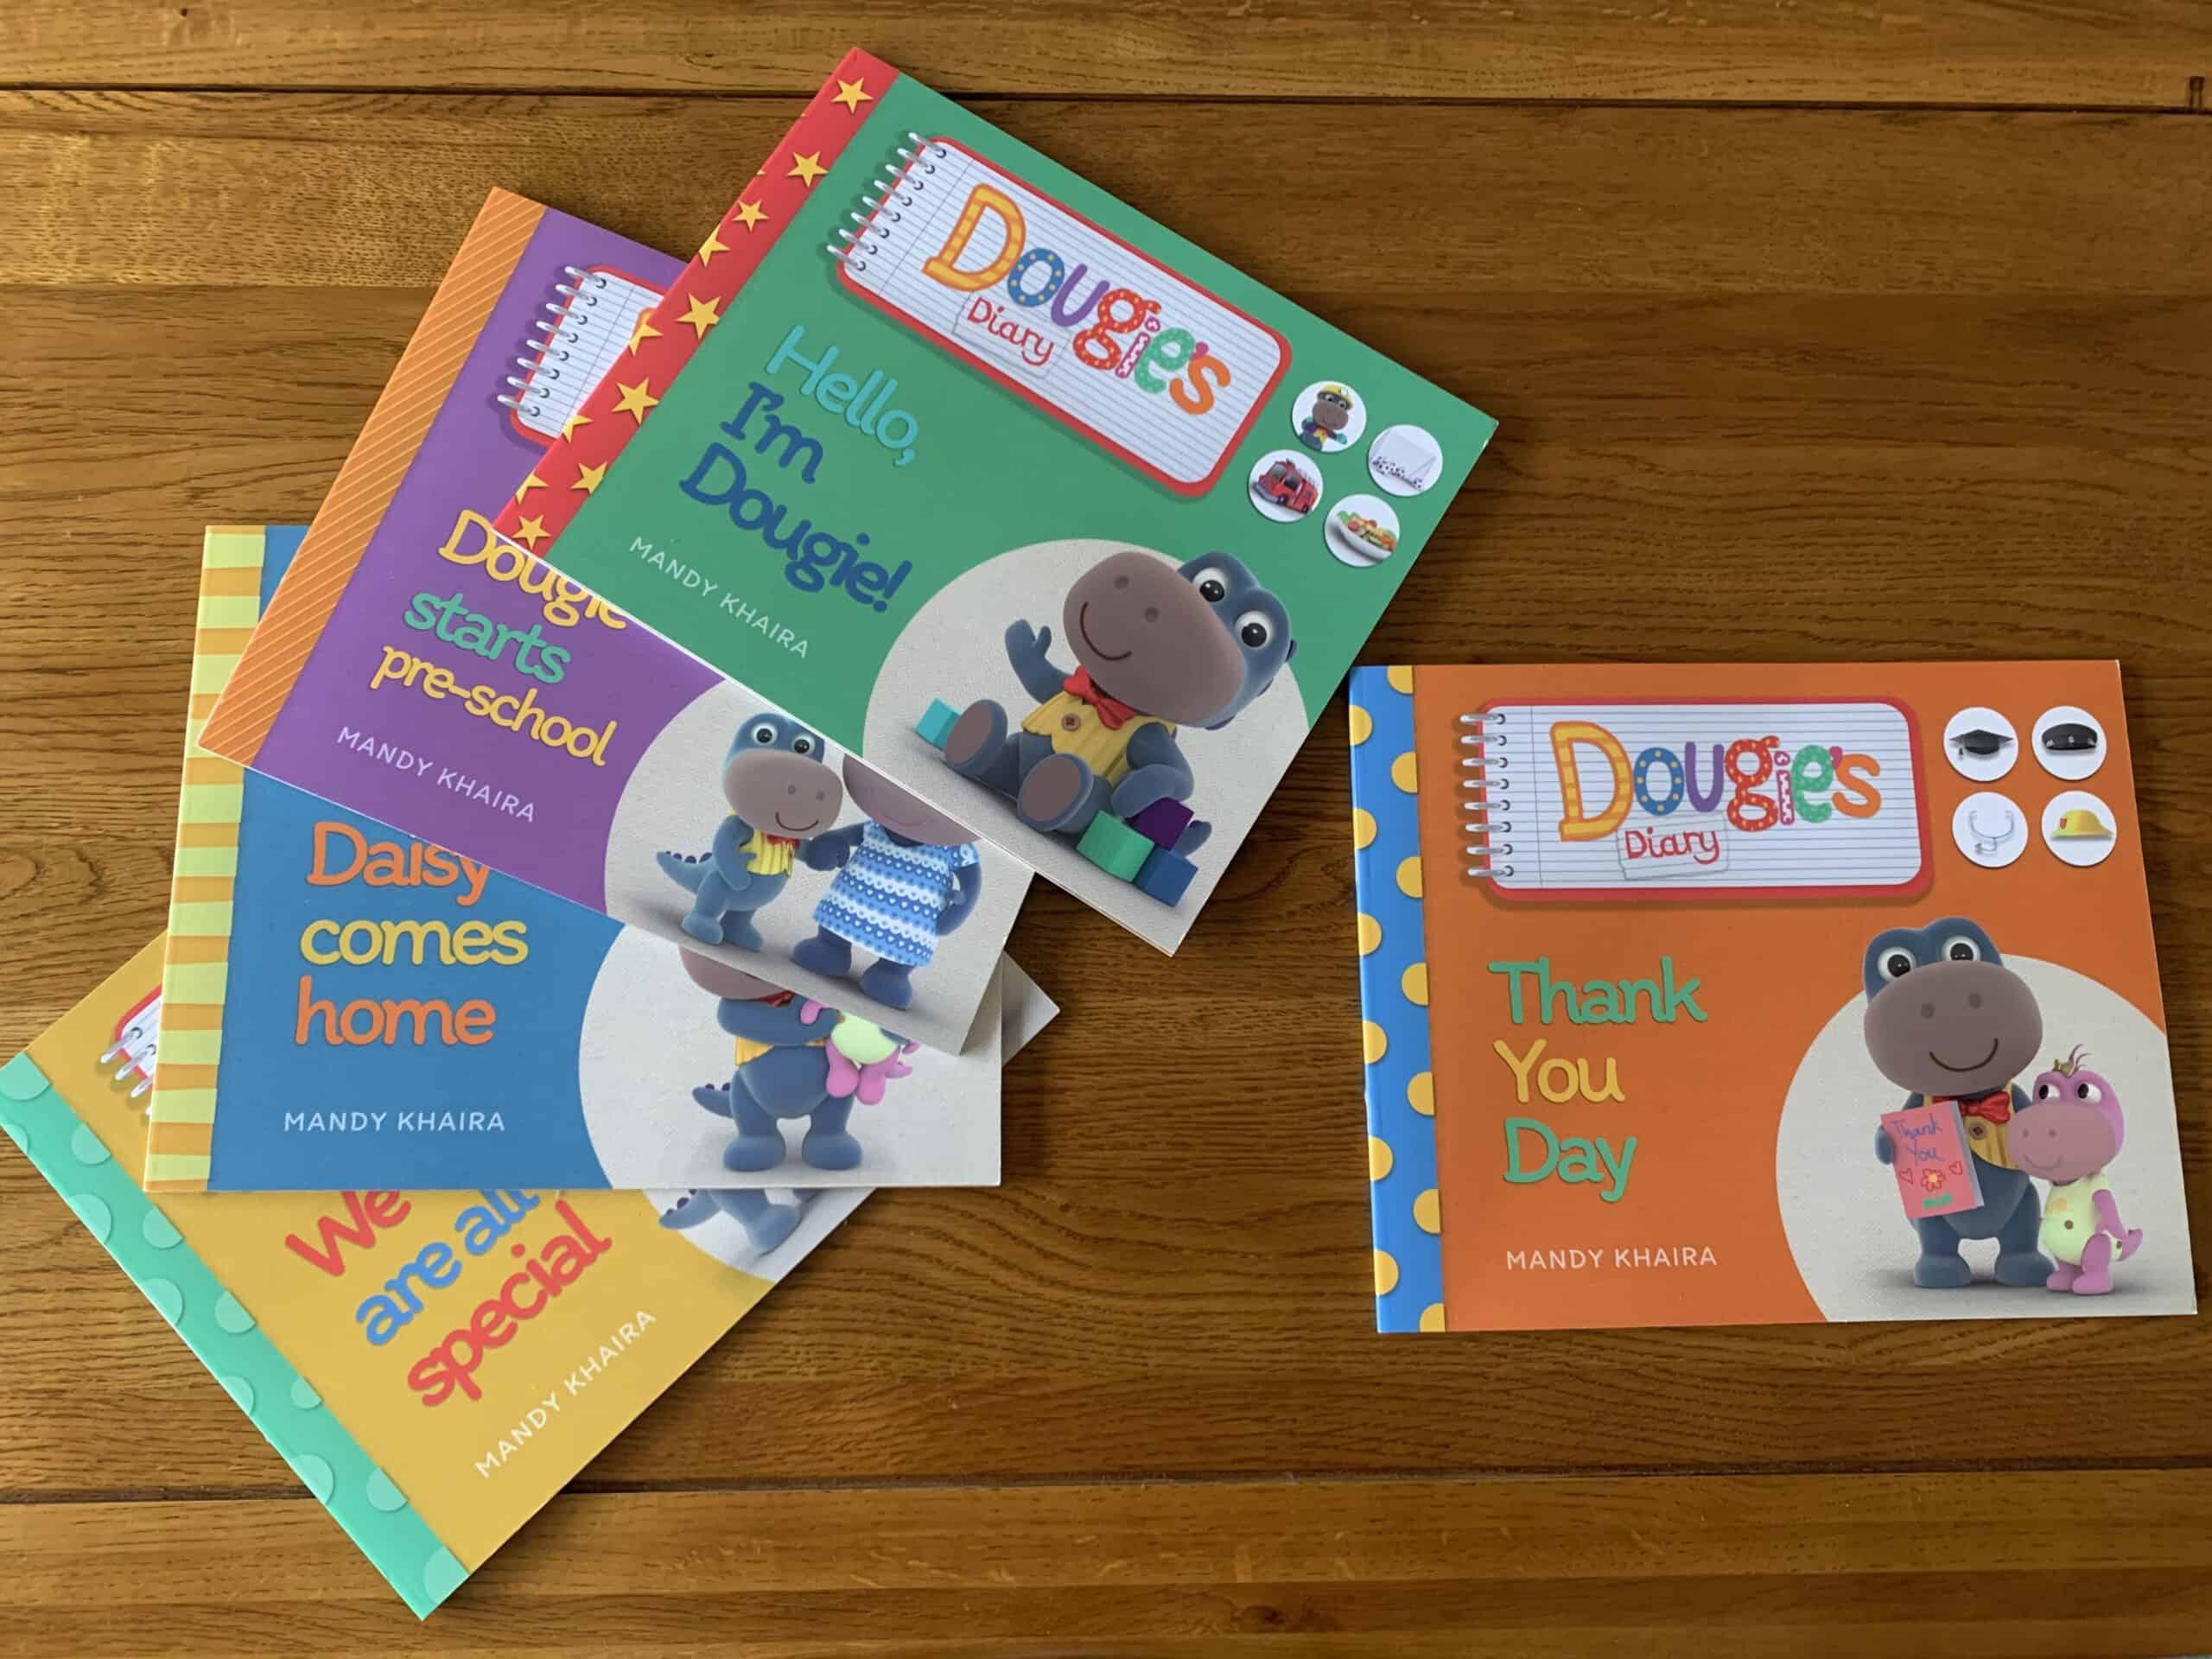 Dougie's Diary Season 1